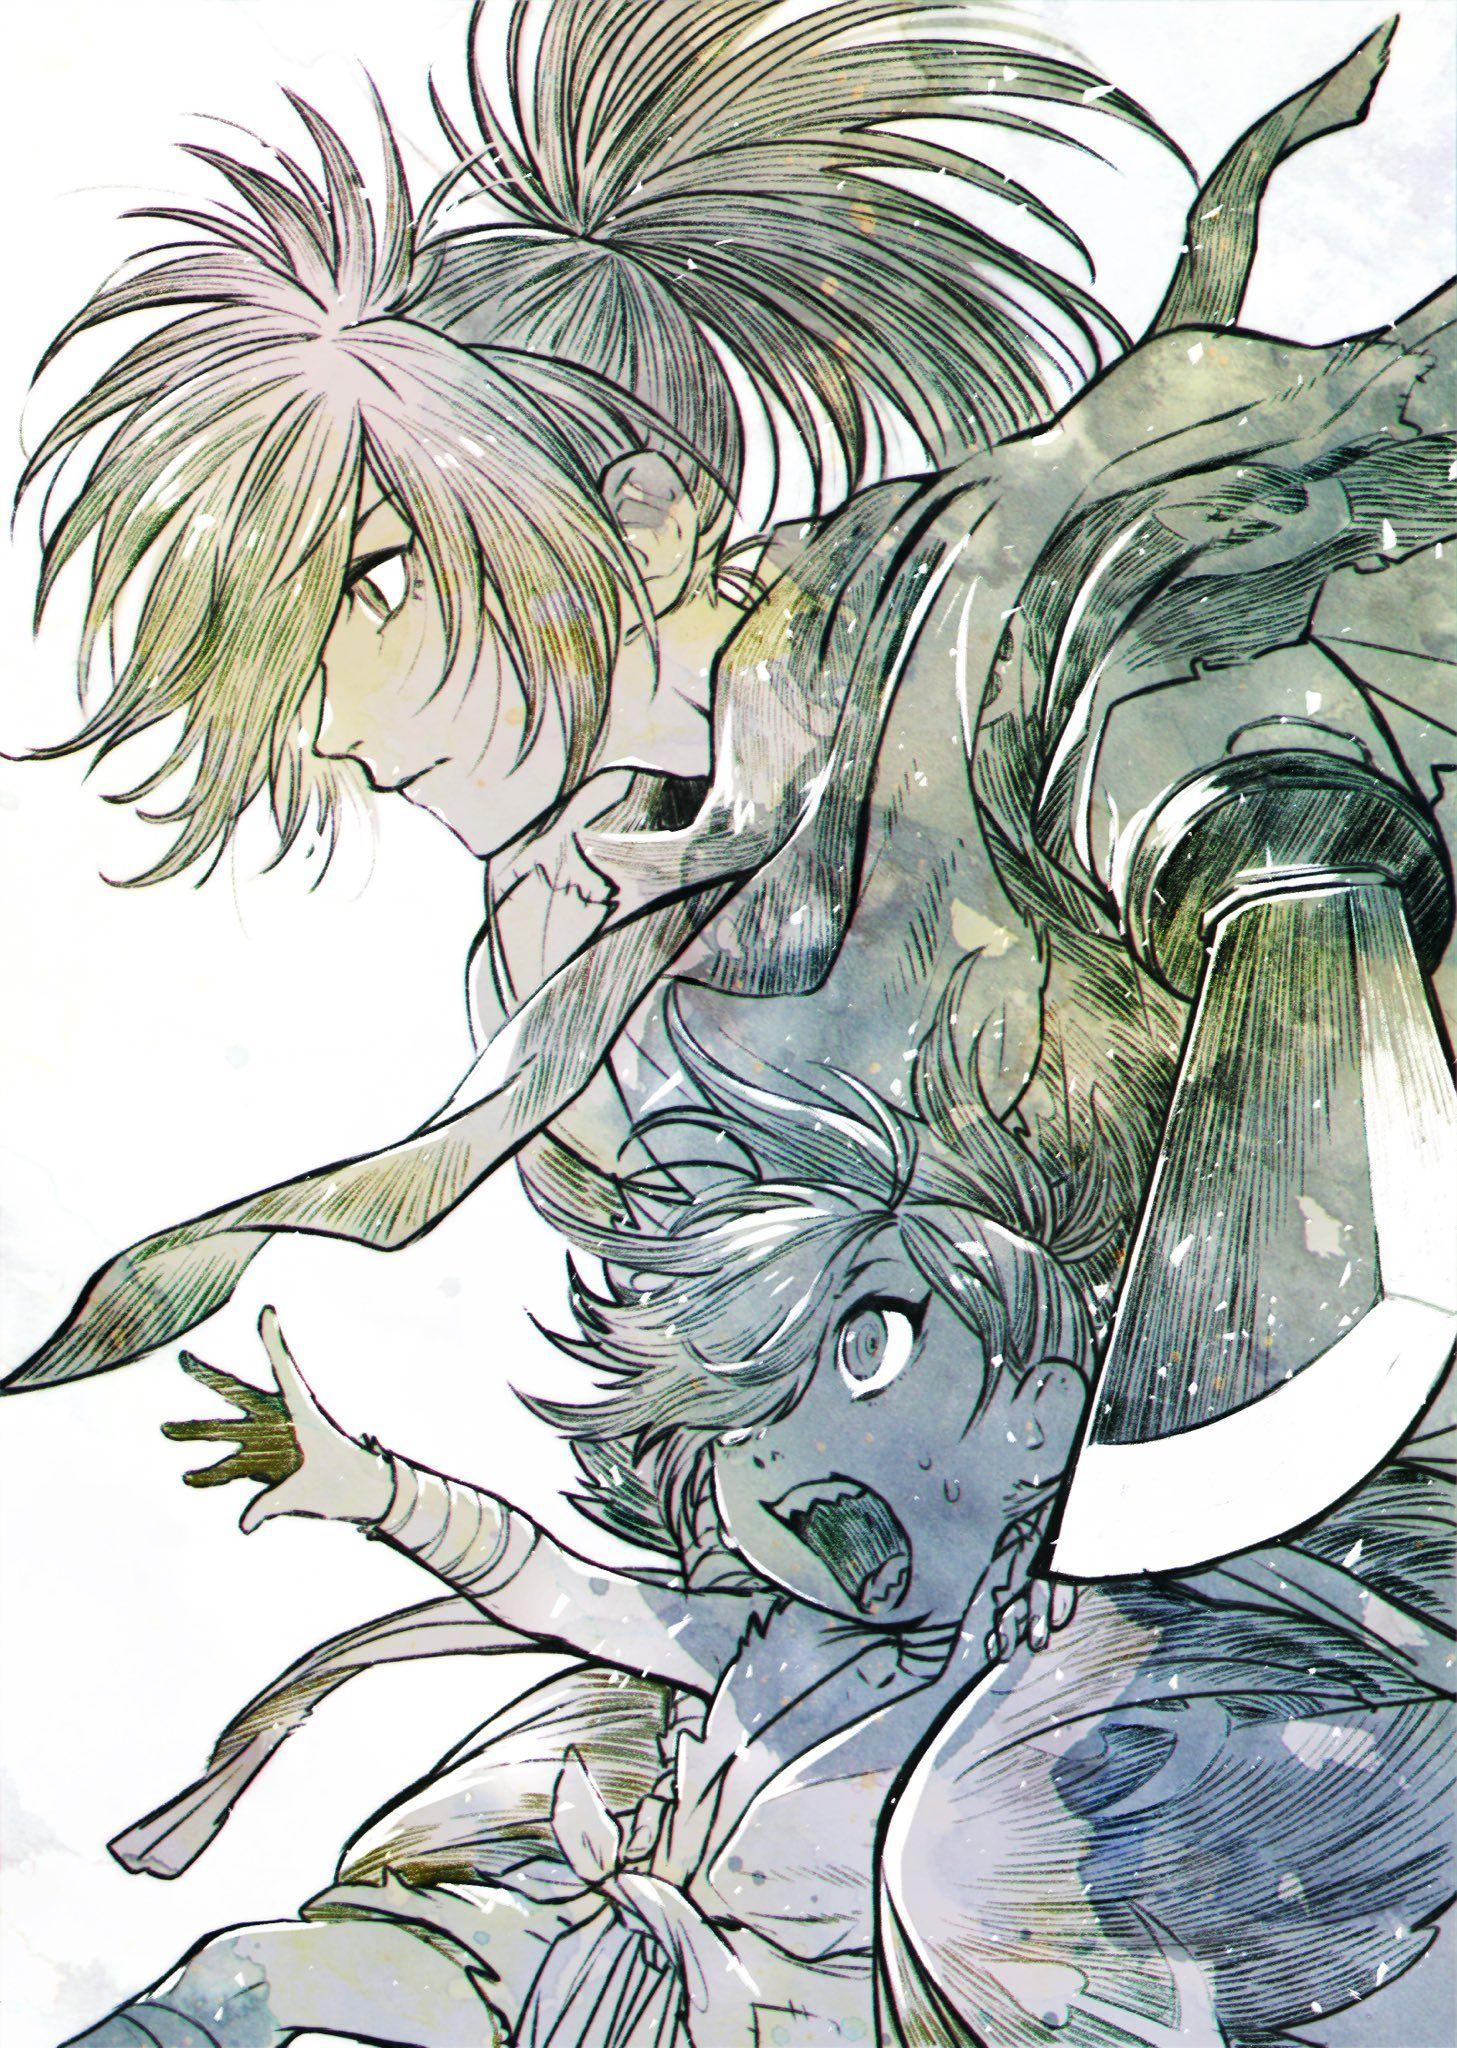 LATEST MANGA UPDATES Read Free Manga Online at mangageez